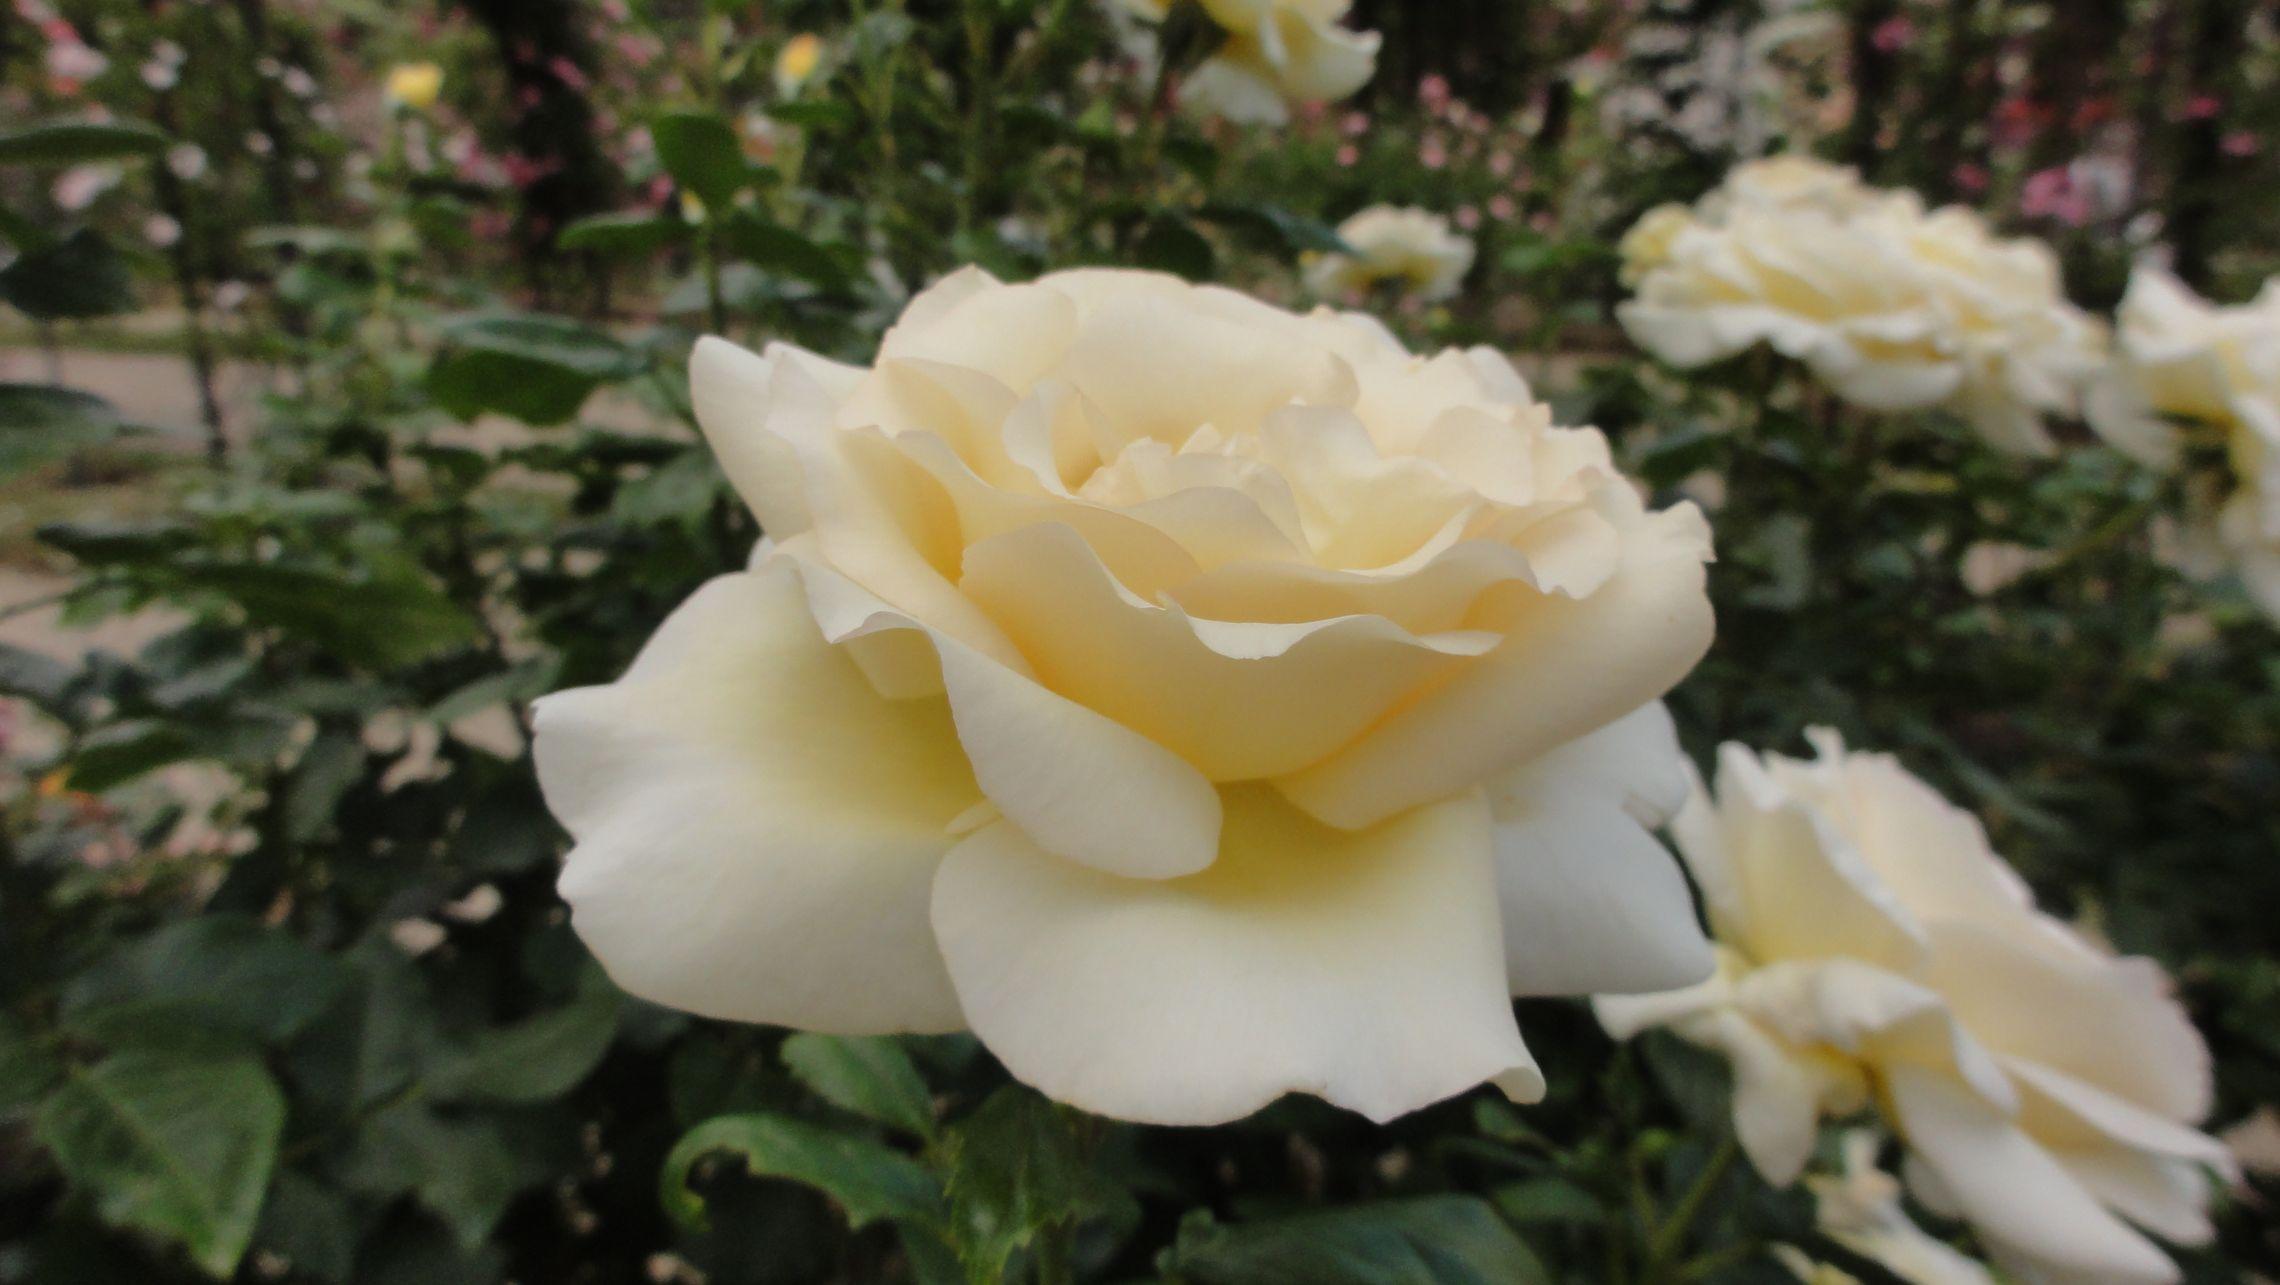 20170602 roseraie vdm 08